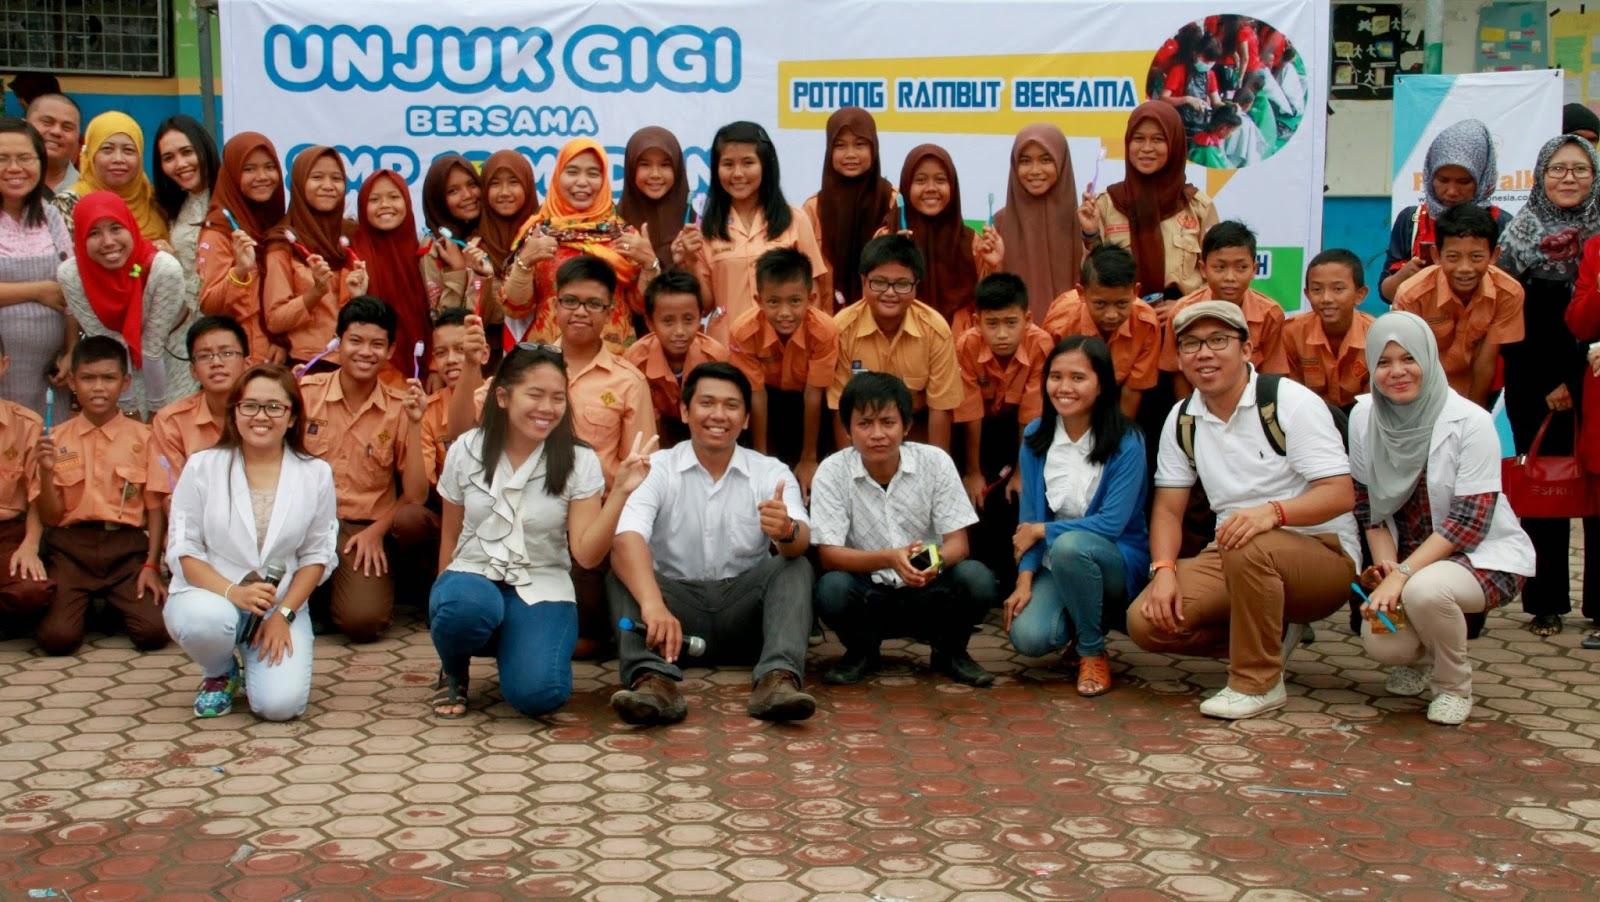 IKSA'93 – FunTalk Indonesia Unjuk Gigi Bersama SMP Negeri 16 Medan